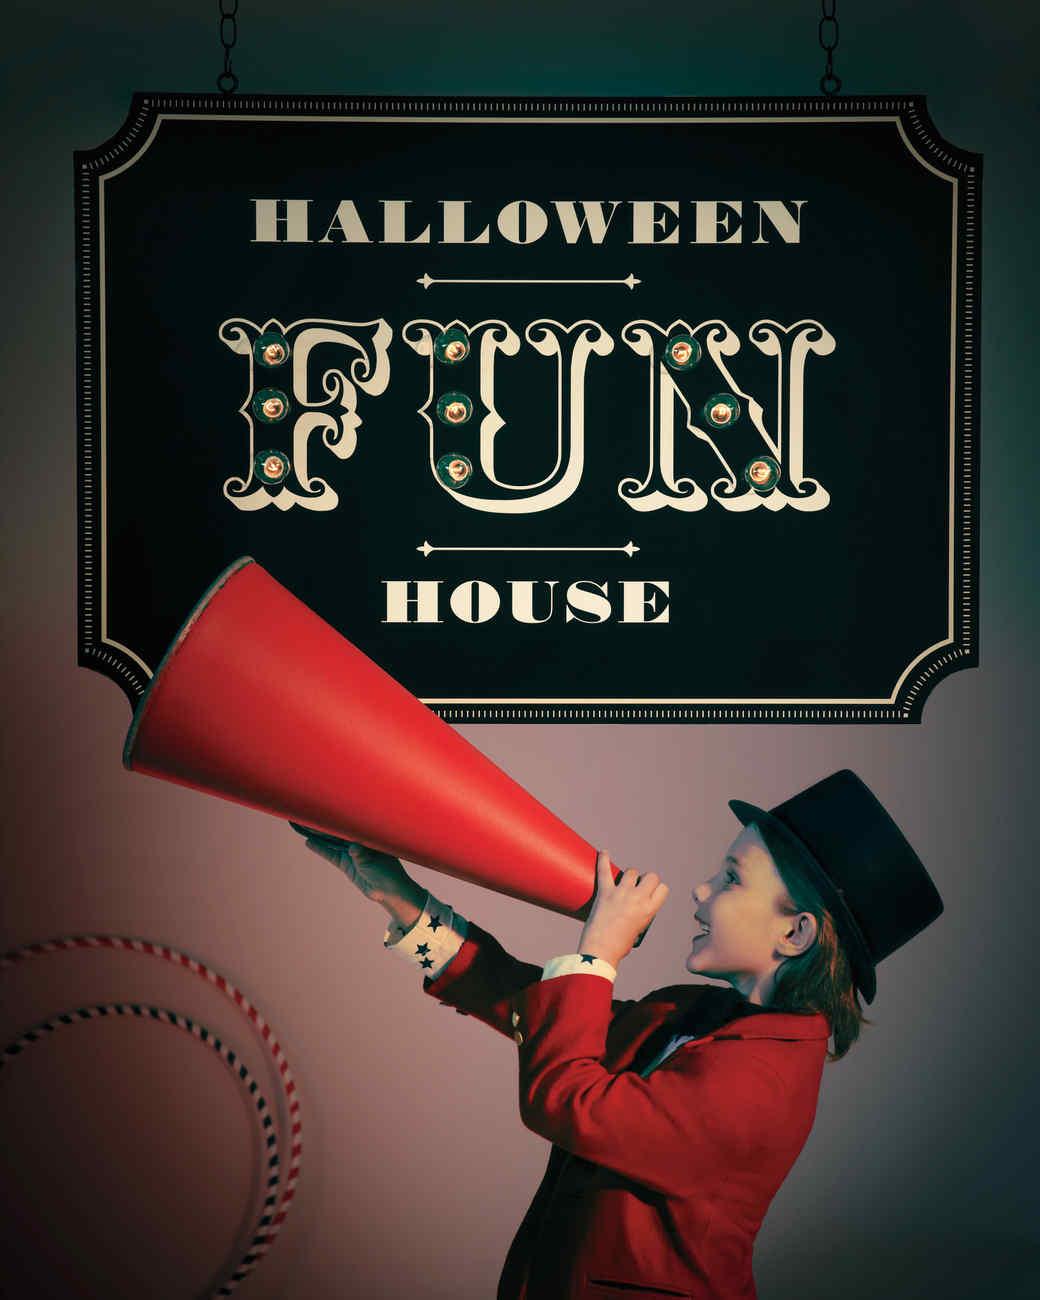 fun-house-sign-038-md109073.jpg